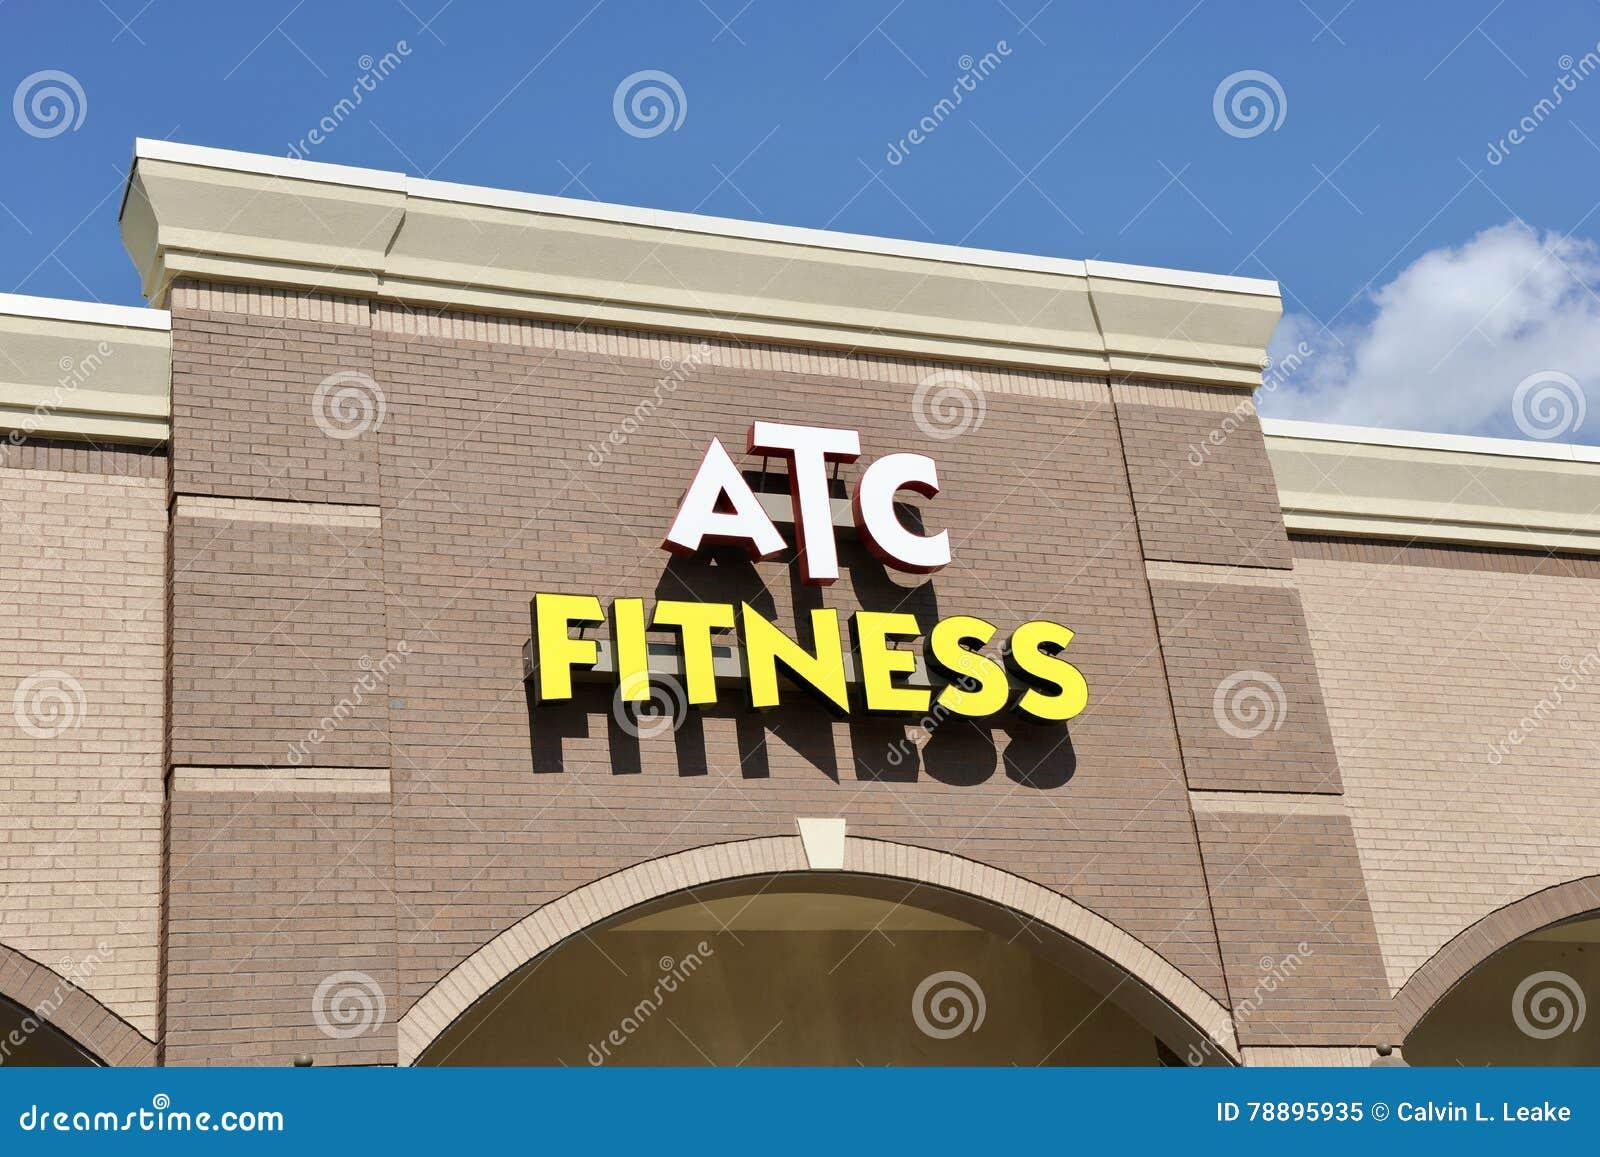 atc fitness gym sign memphis tn editorial photo 78895935. Black Bedroom Furniture Sets. Home Design Ideas